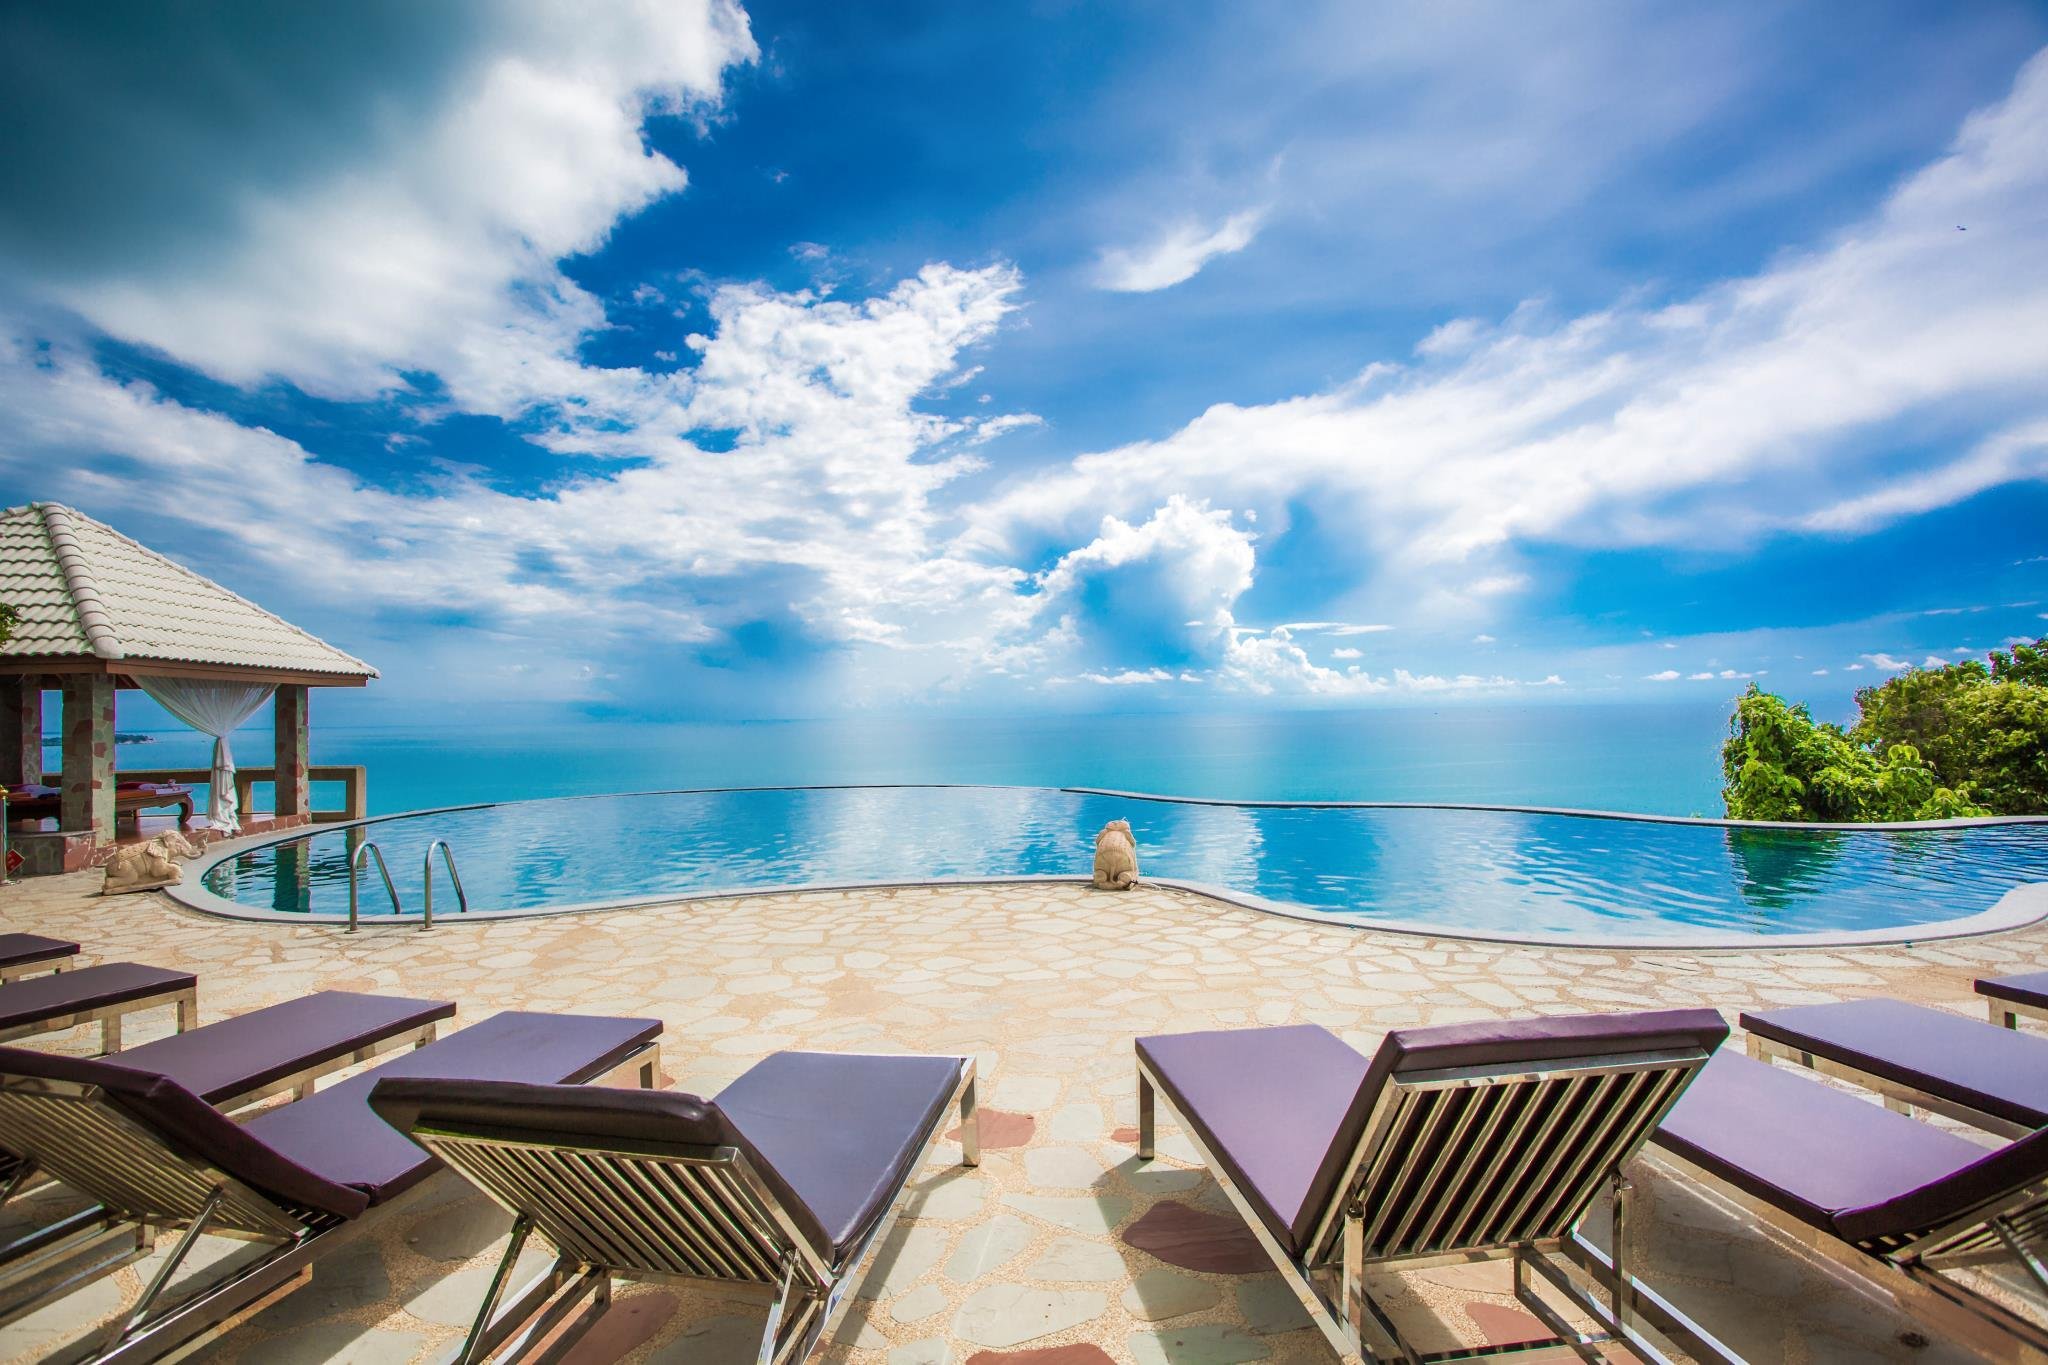 Samui Bayview Resort & Spa สมุย เบย์วิว รีสอร์ต แอนด์ สปา